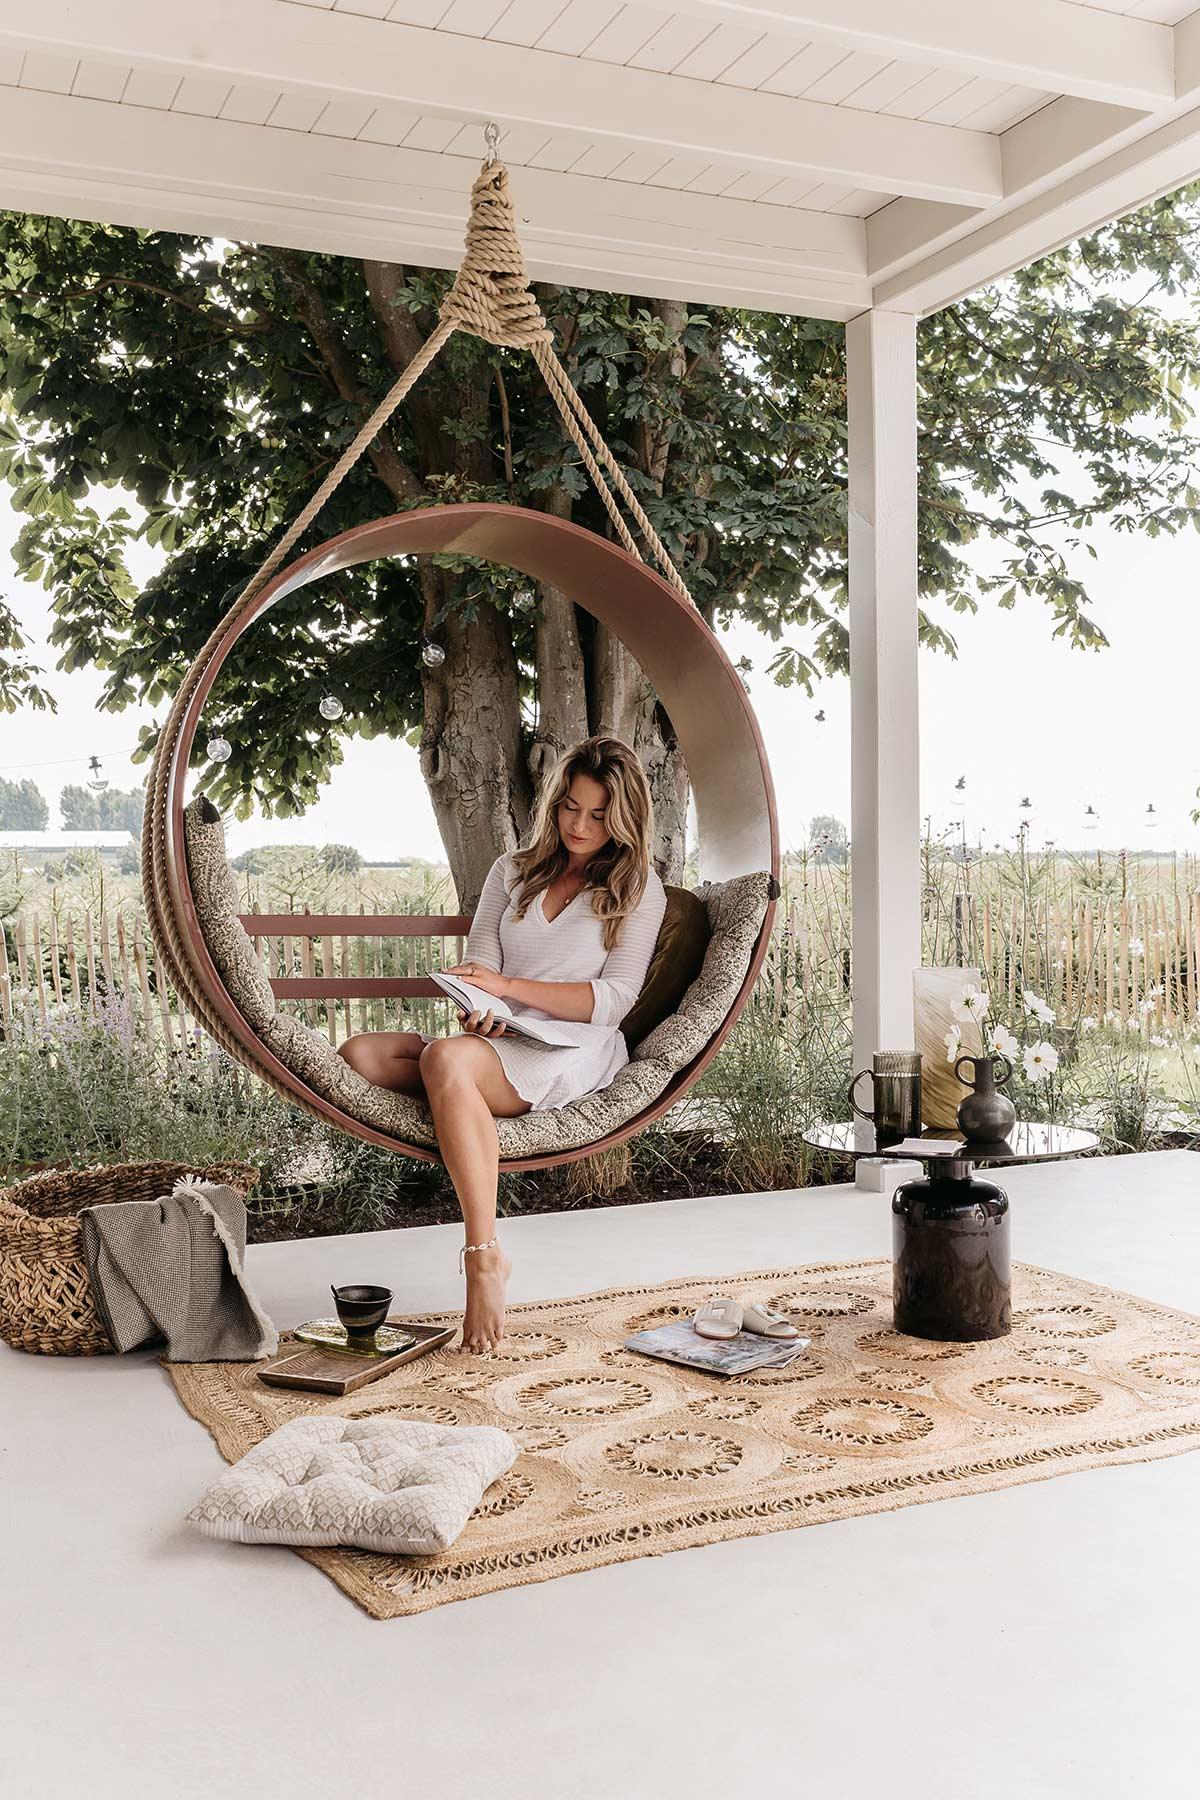 DIY hangstoel veranda - Tanja van Hoogdalem